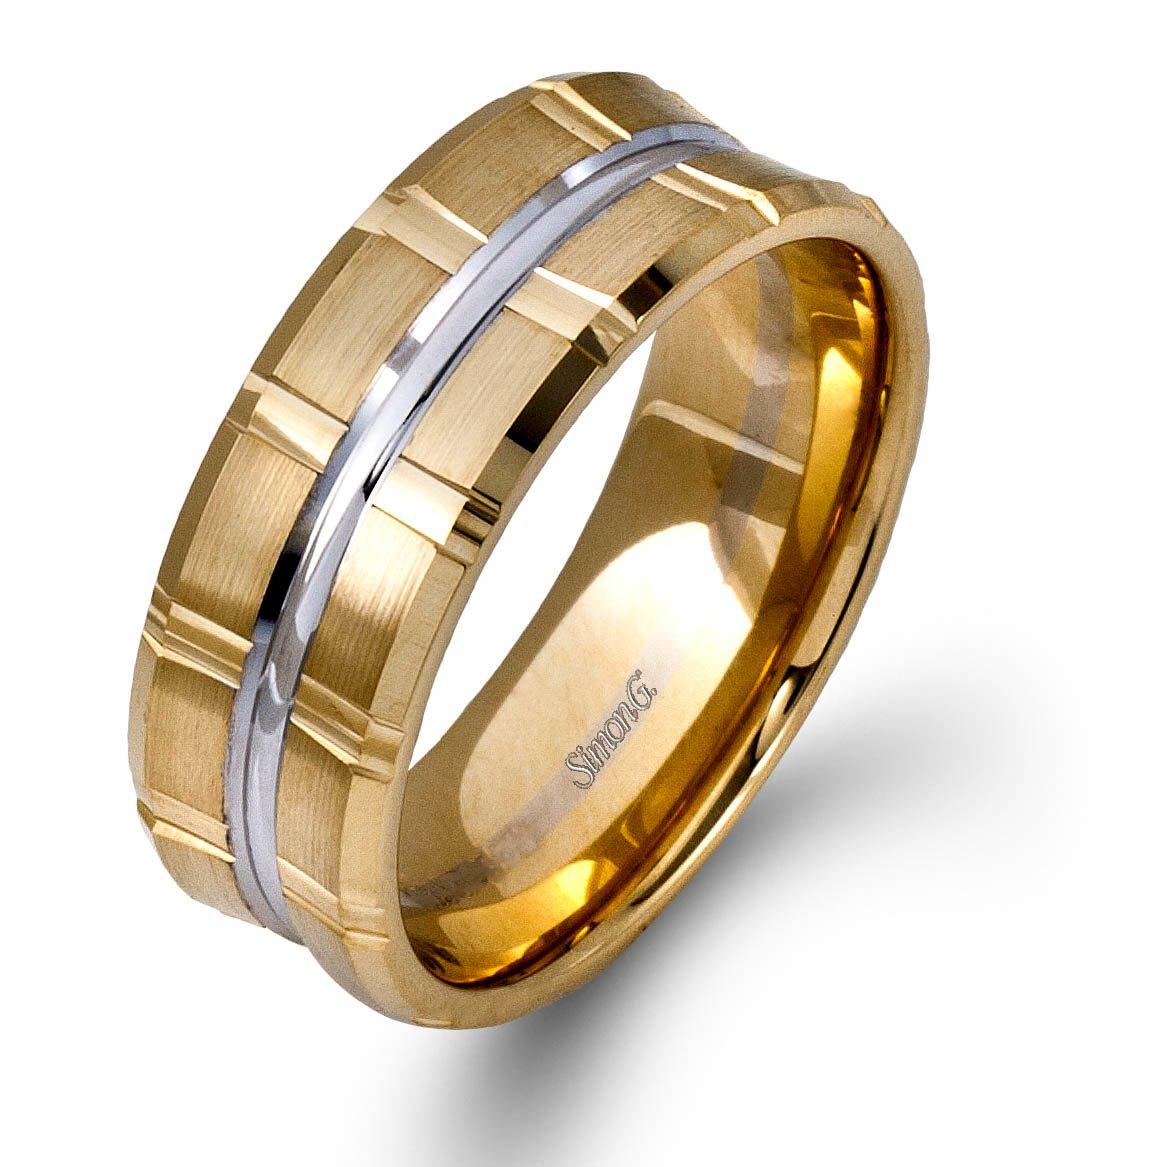 3c6e94e9832 Simon G Plain Yellow Gold Mens Wedding bands. Designer Engagement Rings    Fine Jewelry  Arthur s Jewelers